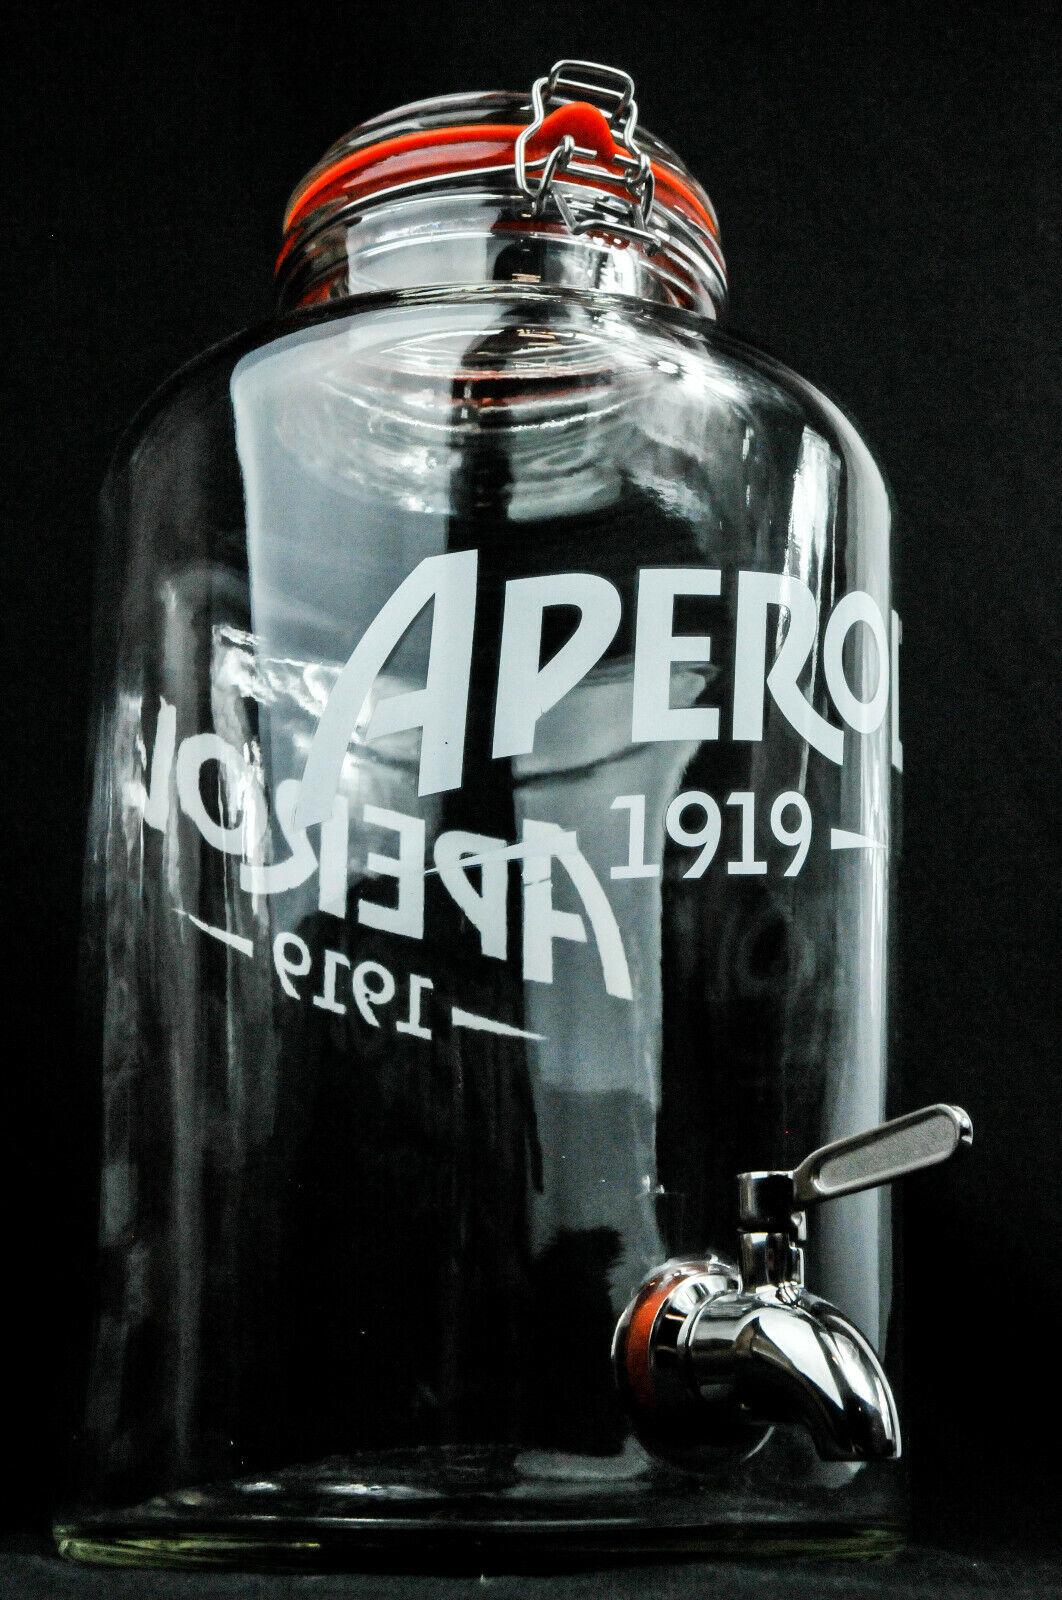 Aperol crie, 8,5 L Table-Zapfanlage, louche zapfglas, bec verseur  table Barrel